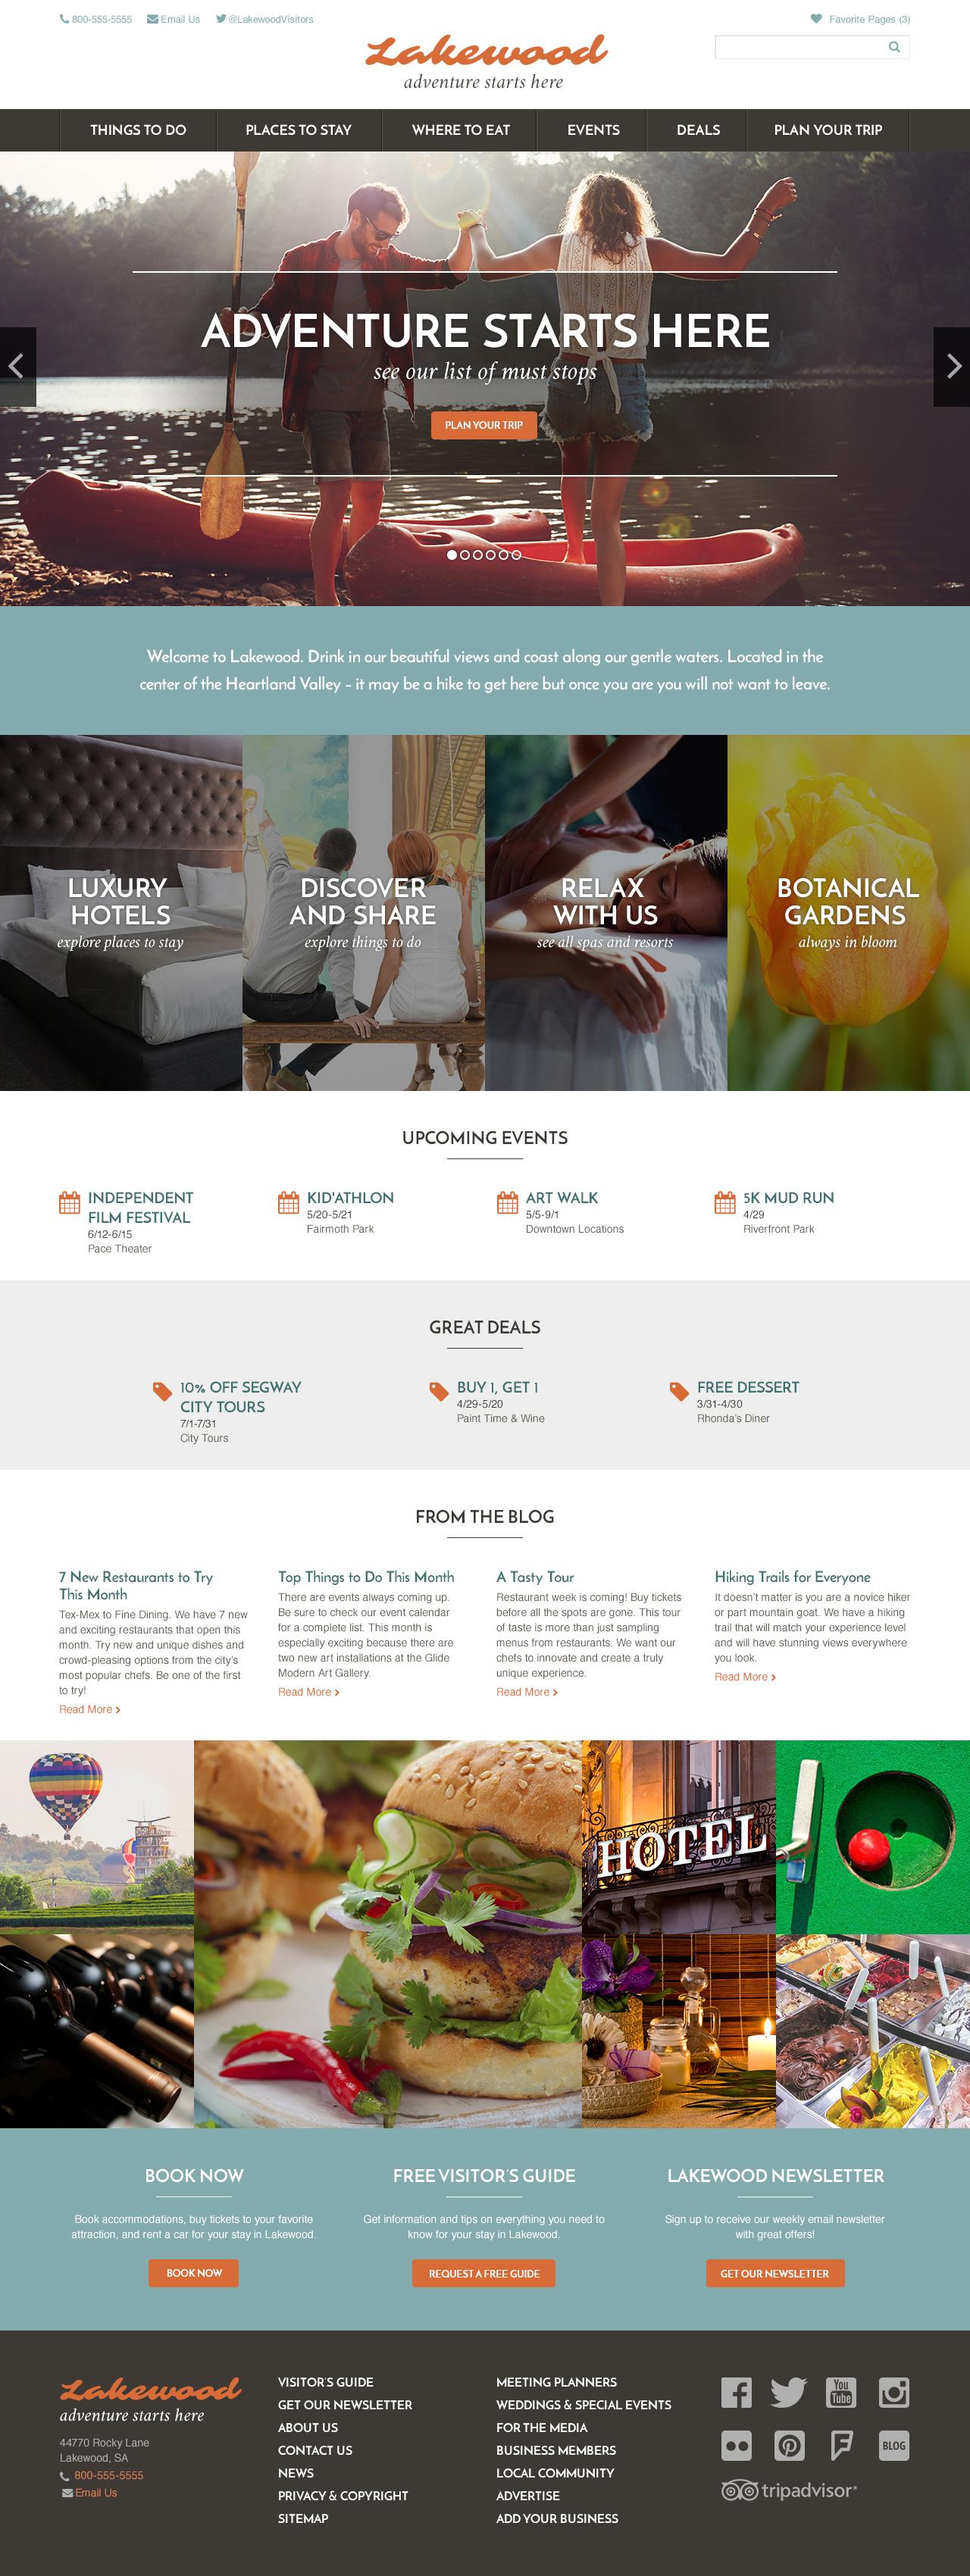 Lakewood Theme Homepage Desktop Preview